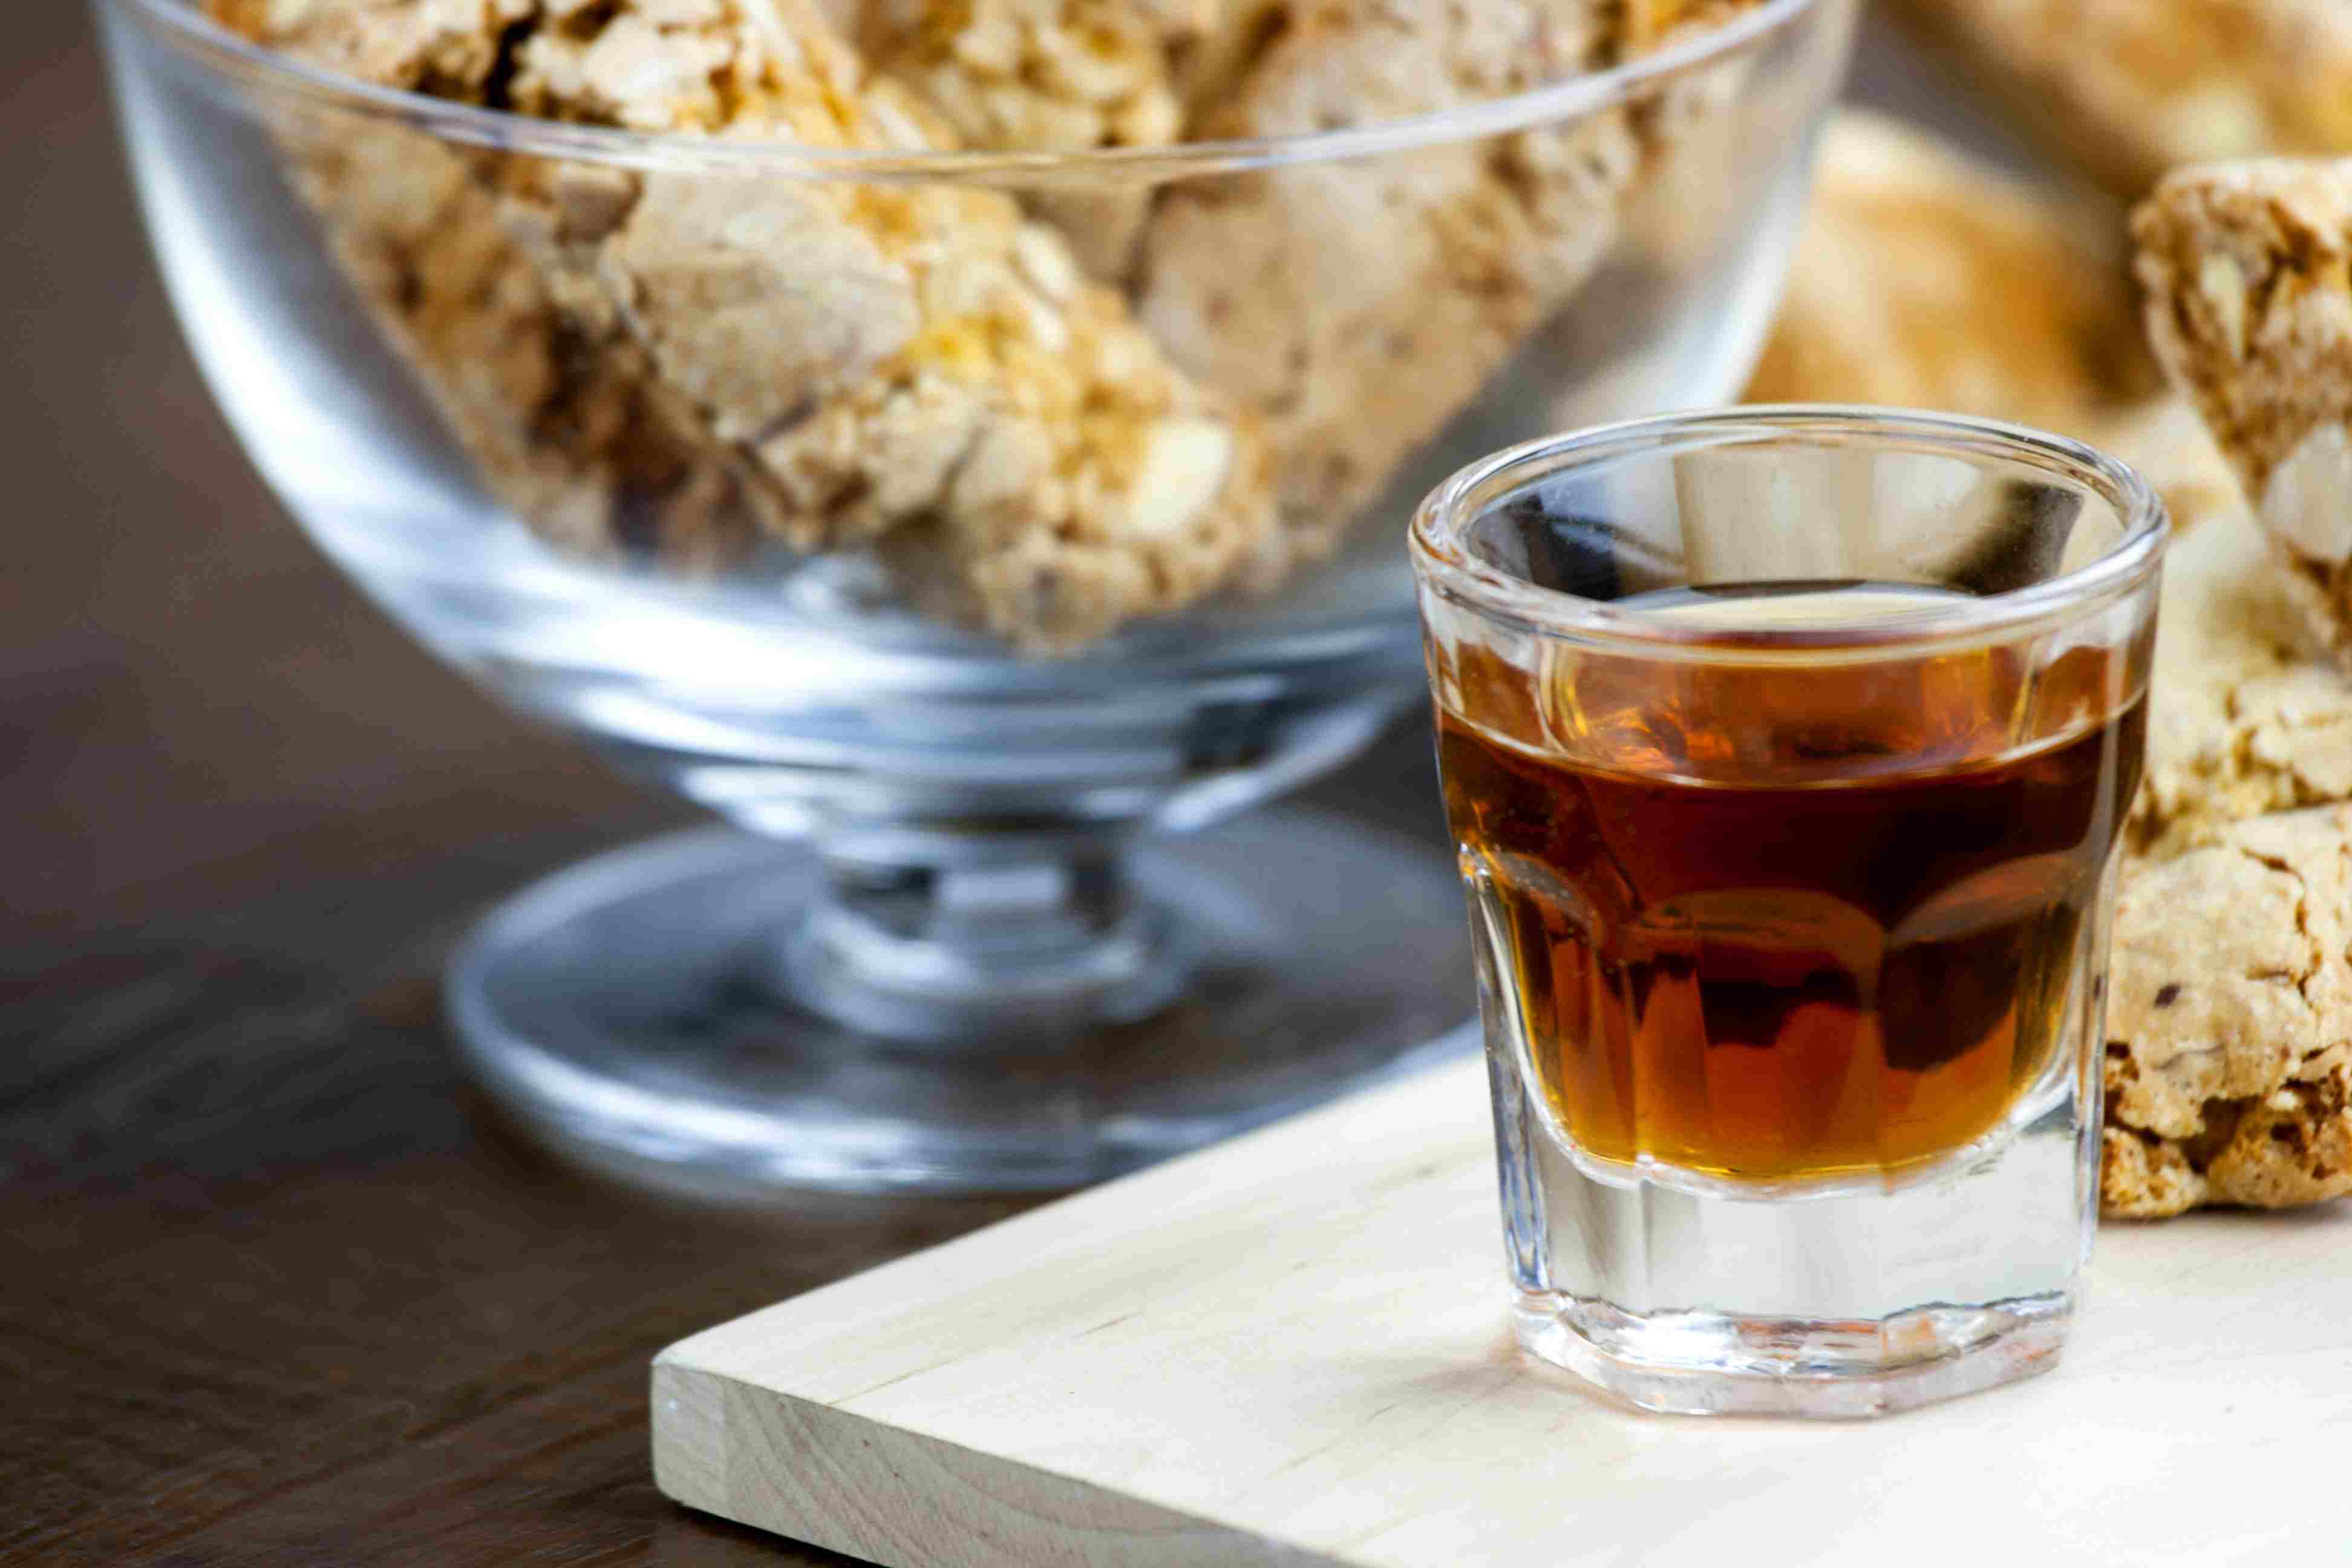 Glass of Homemade Amaro with Biscotti